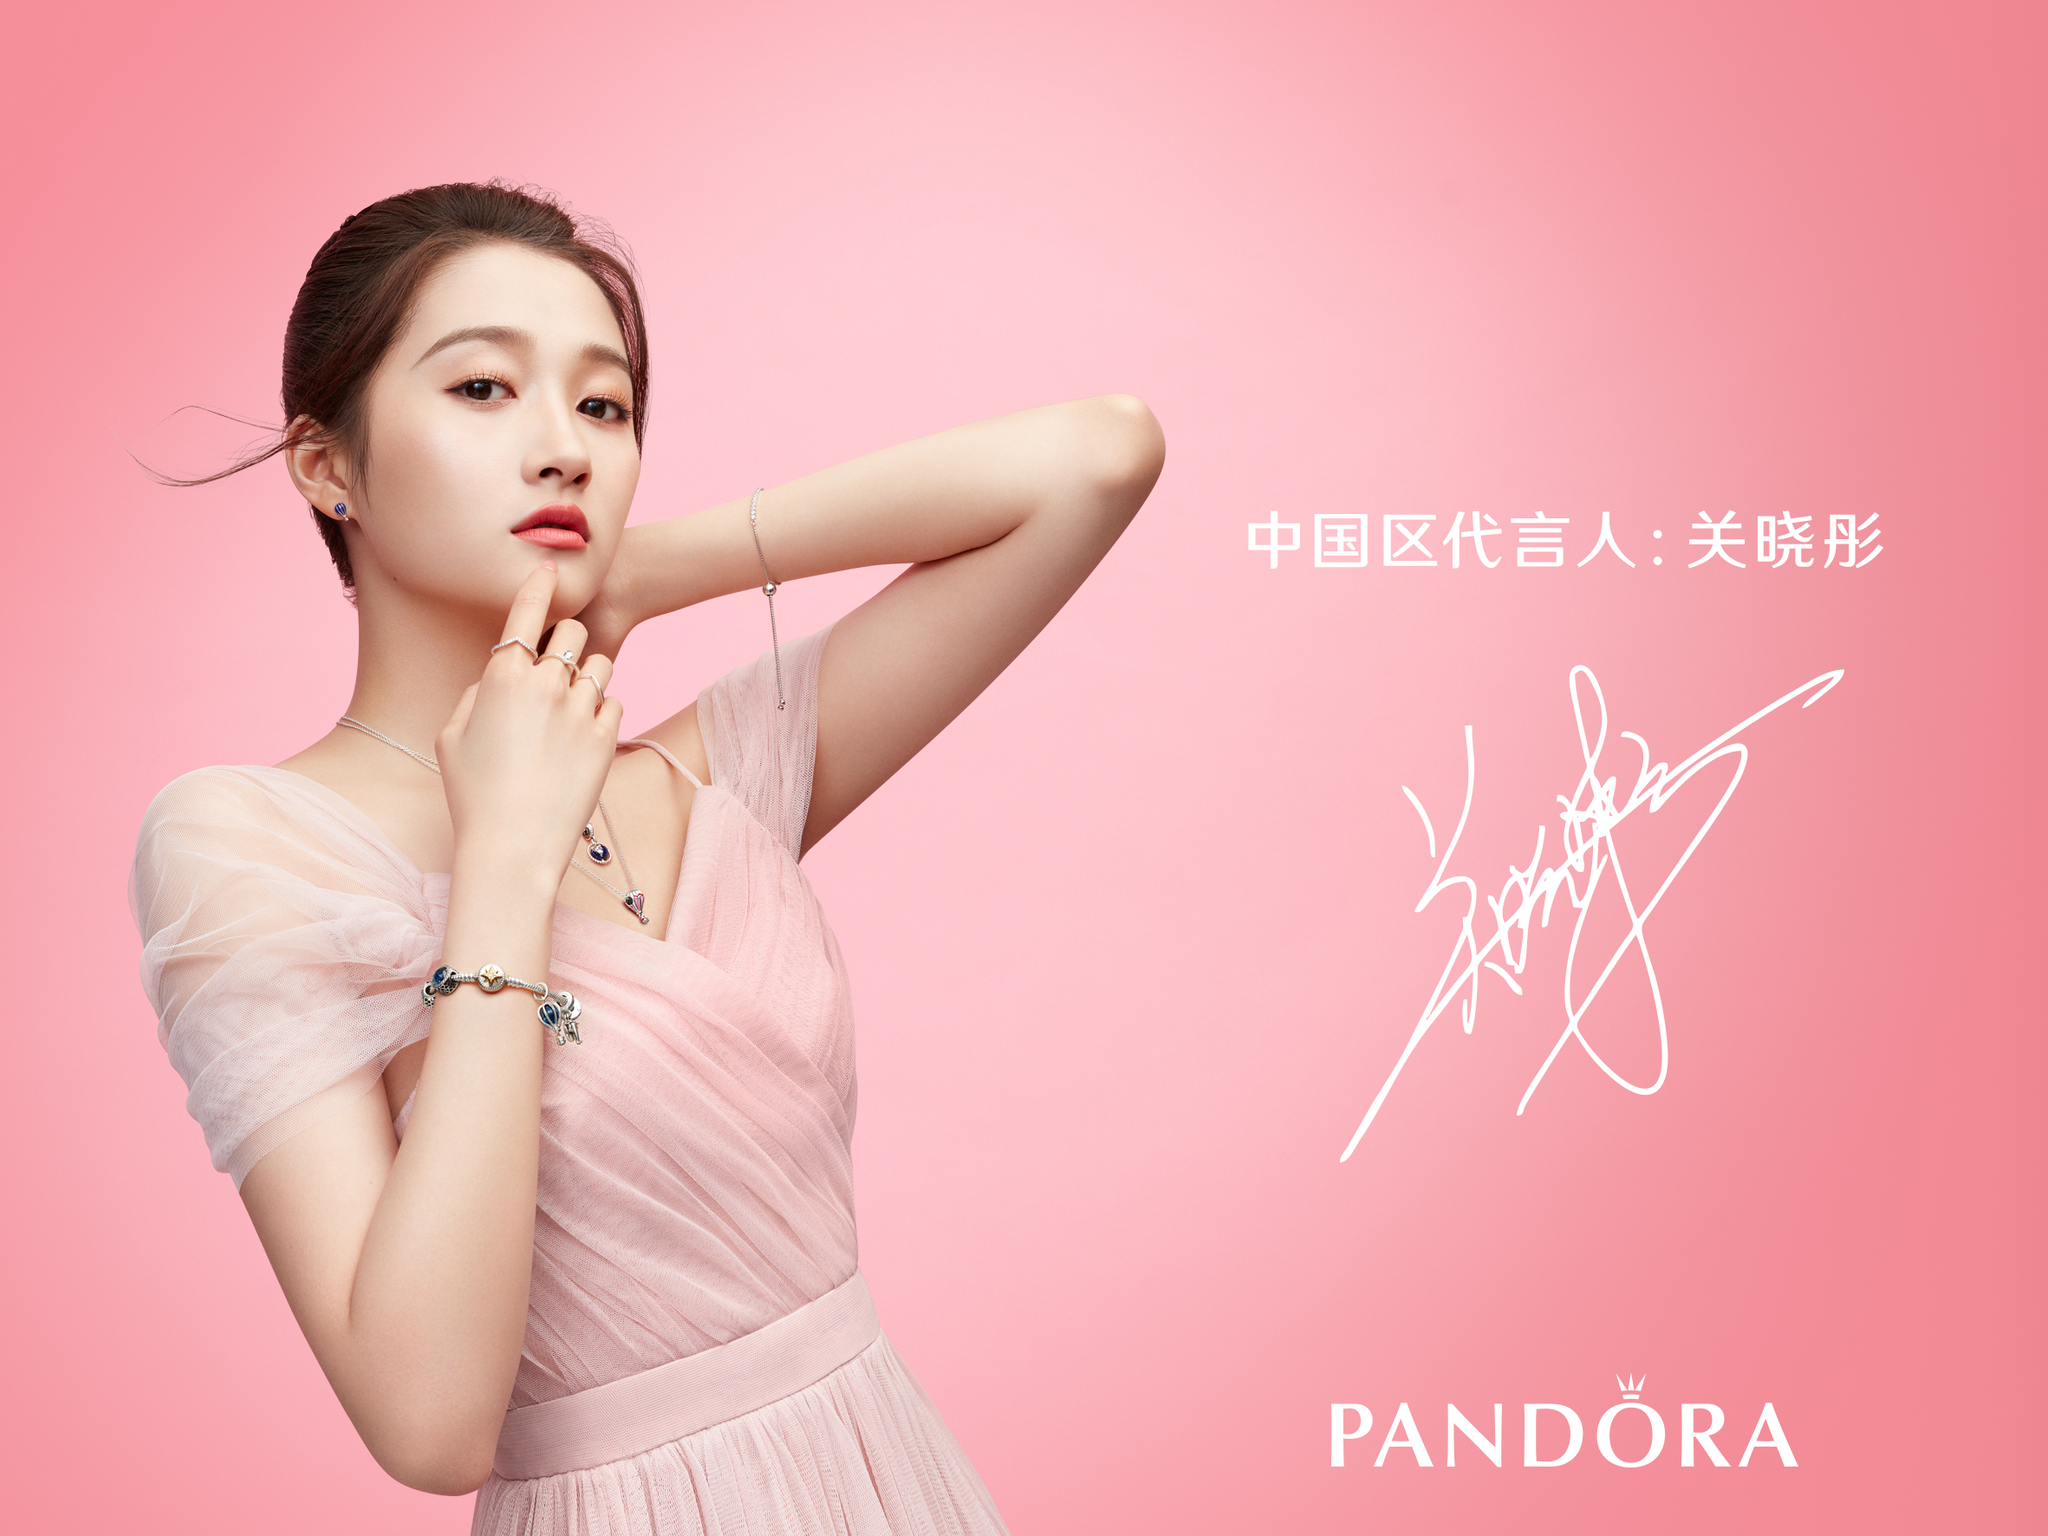 PANDORA潘多拉珠宝宣布关晓彤成为首位中国区品牌代言人